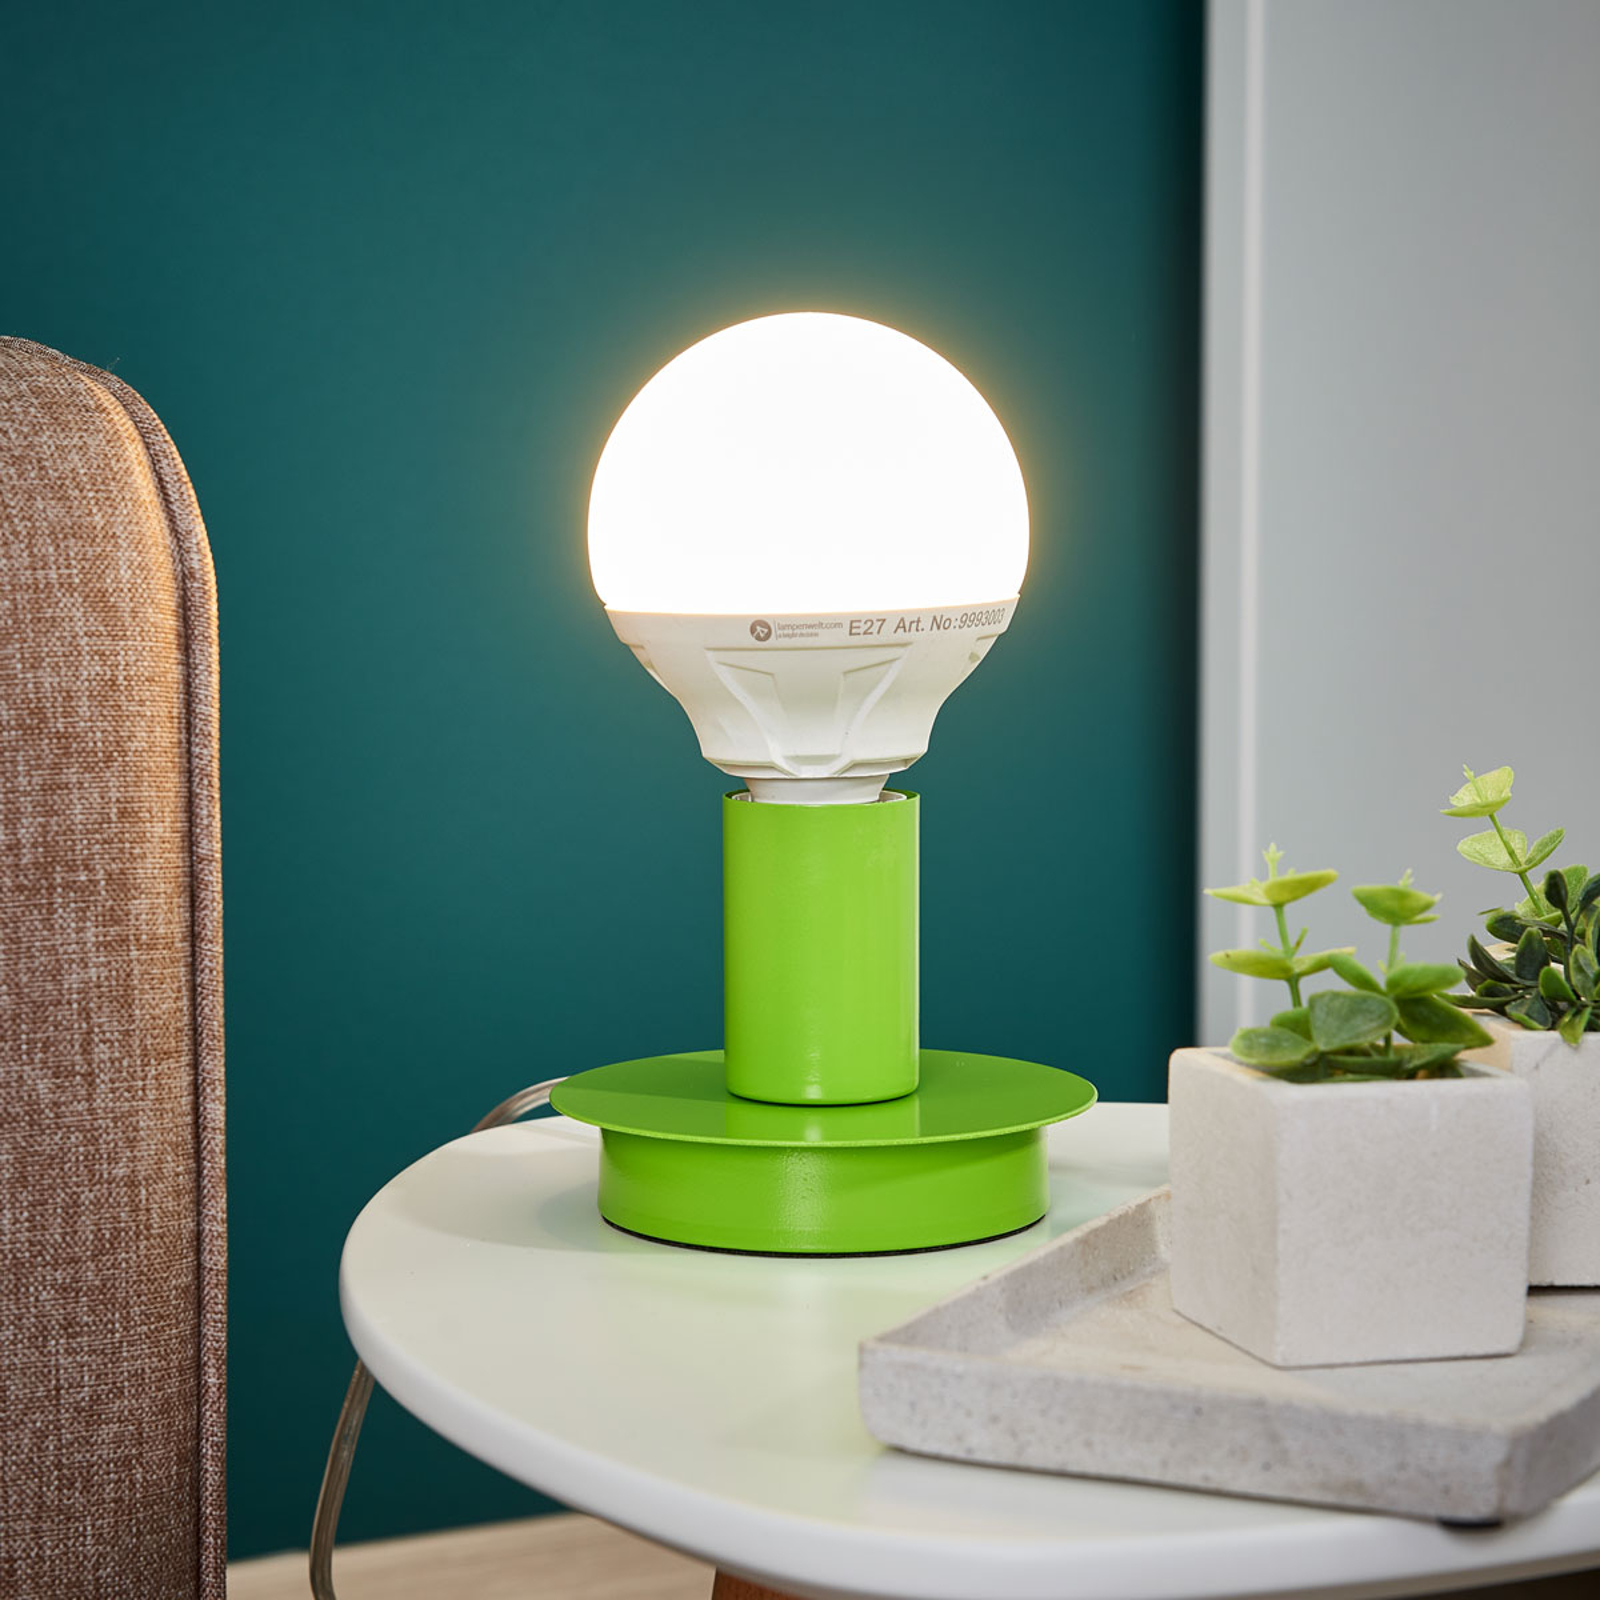 Puristische tafellamp Lumetto - groen